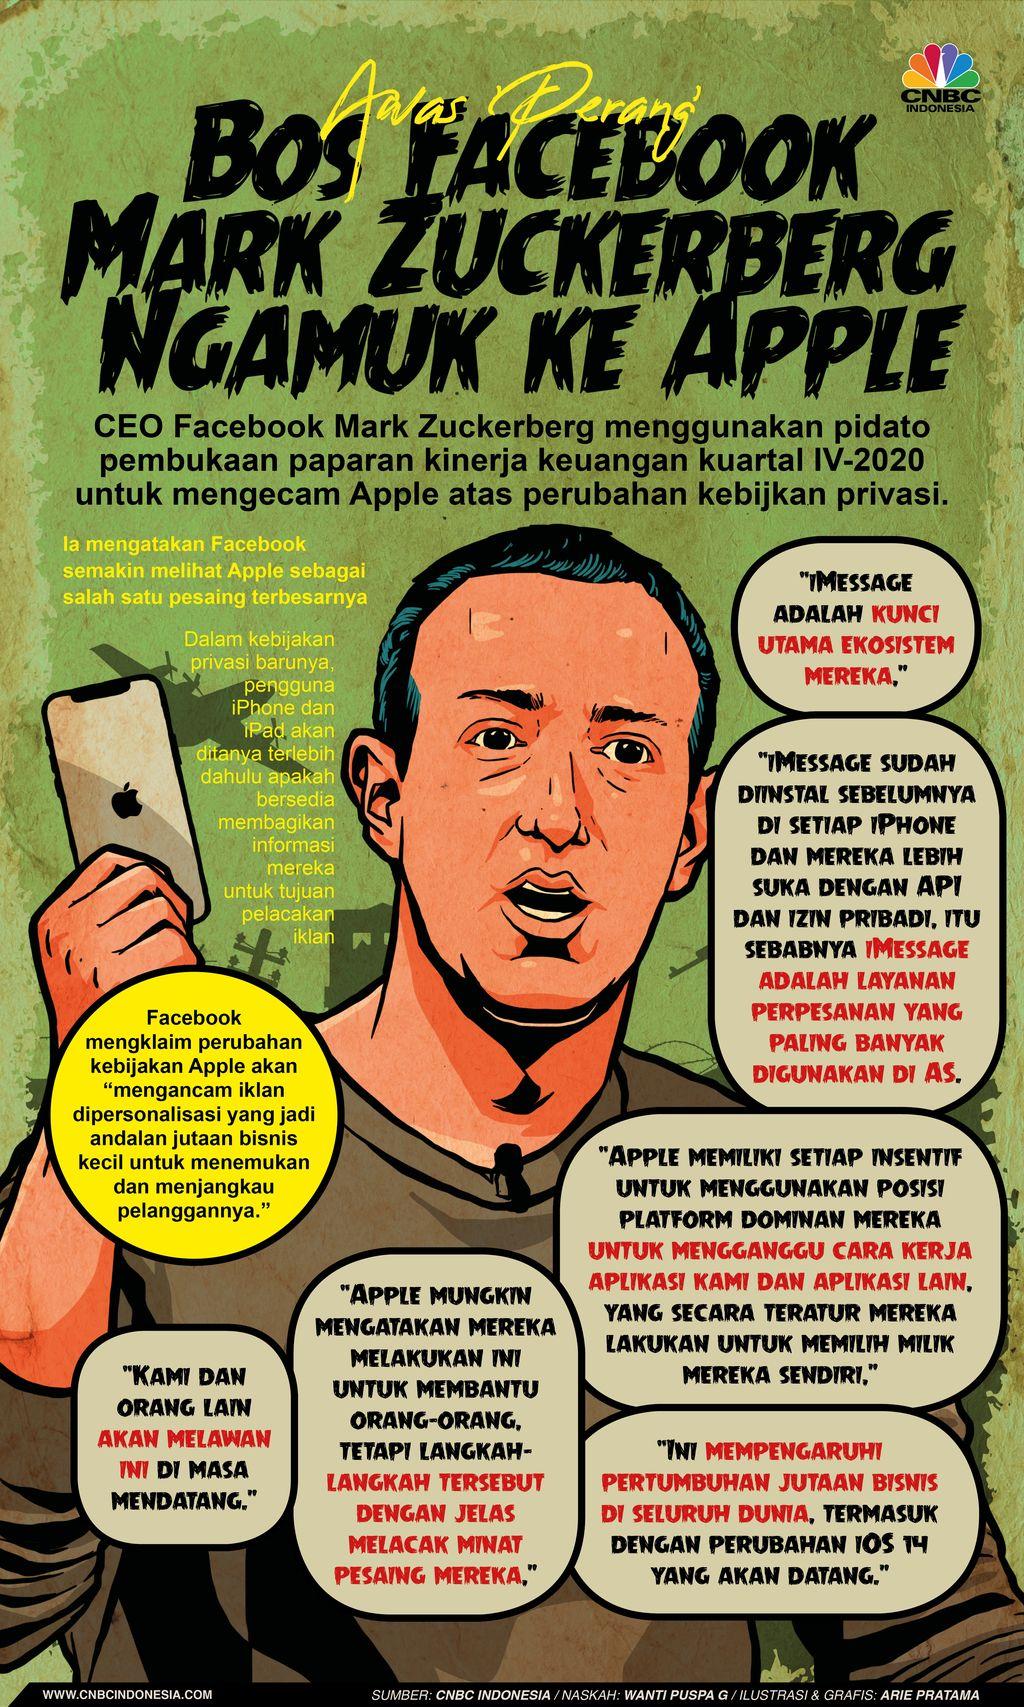 Infografis: Awas 'Perang', Bos Facebook Mark Zuckerberg Ngamuk ke Apple